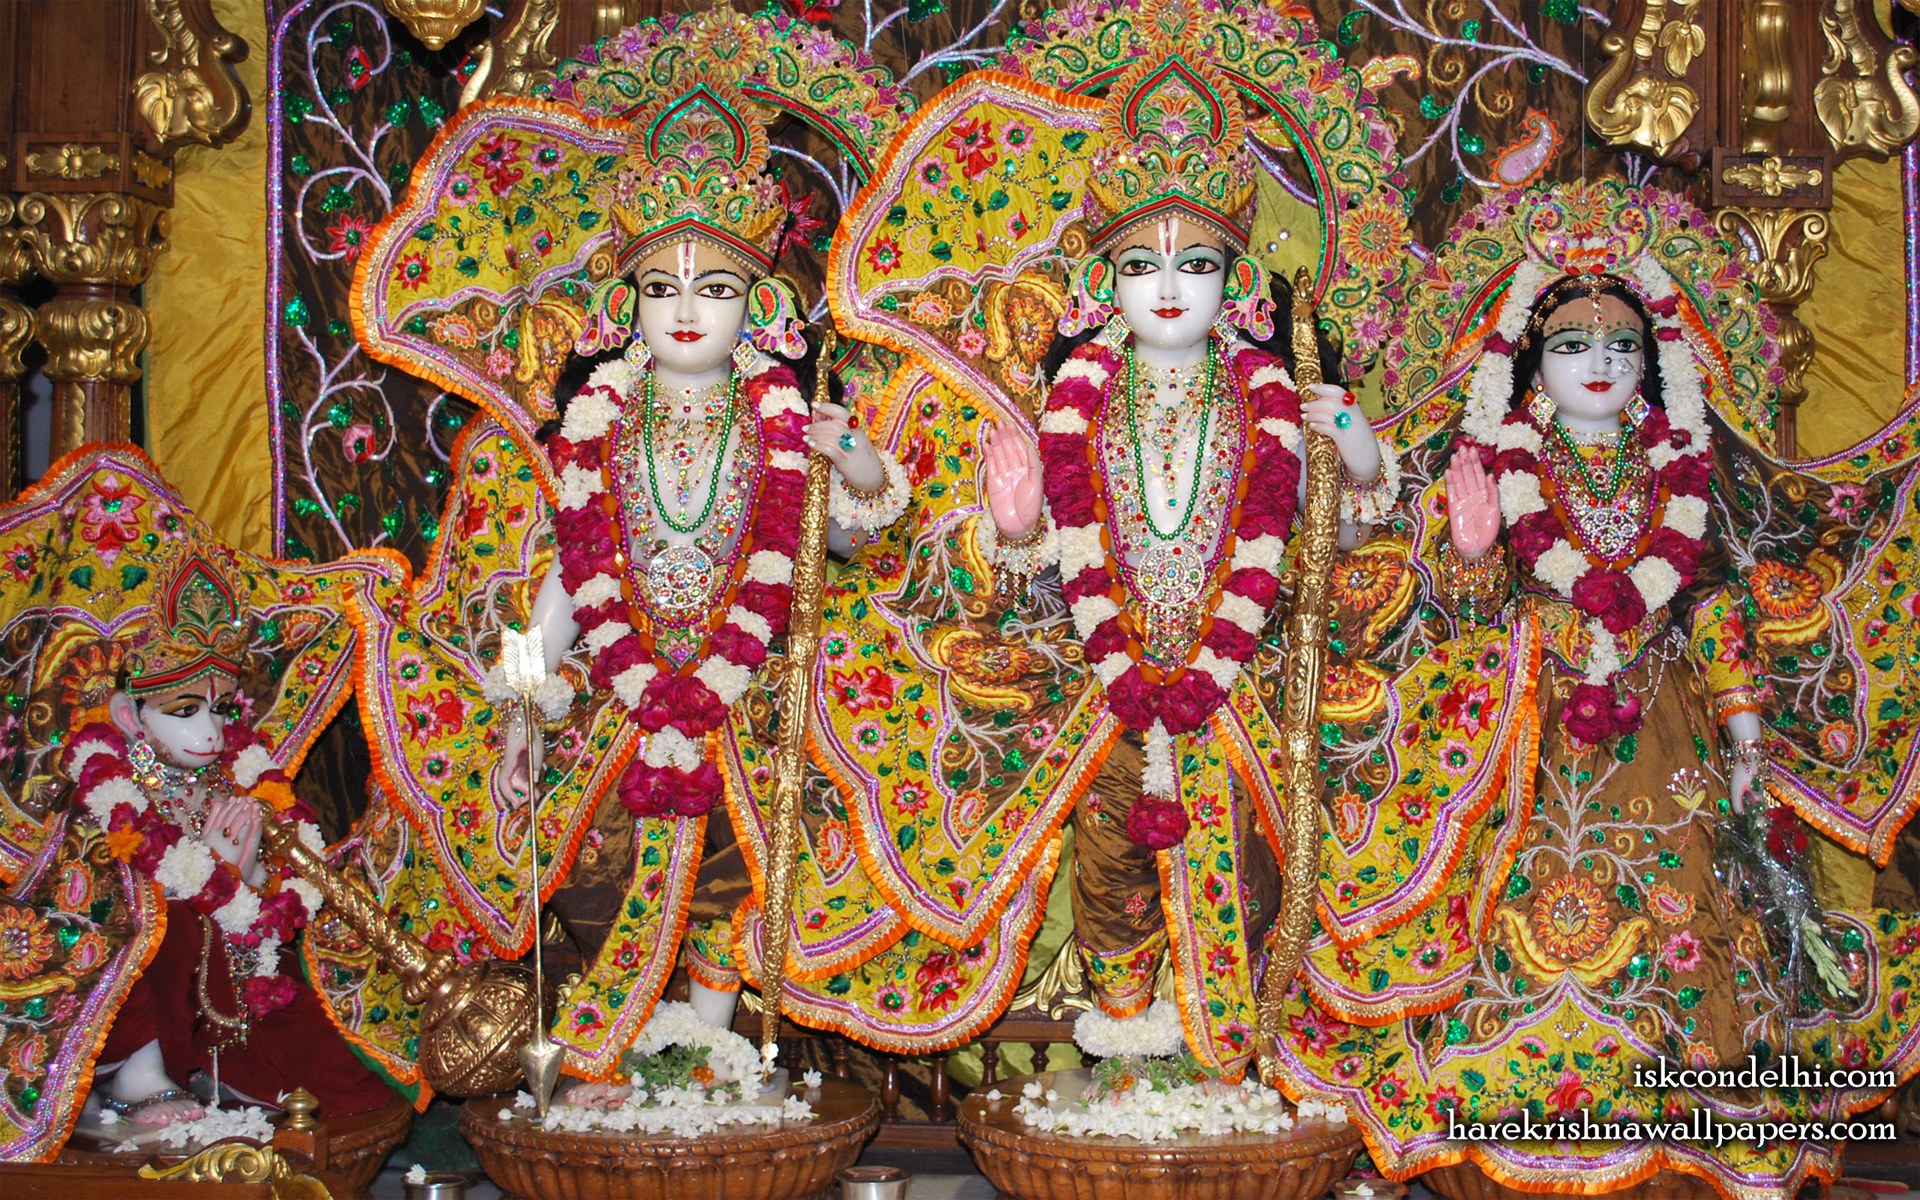 Sri Sri Sita Rama Laxman Hanuman Wallpaper (004) Size 1920x1200 Download